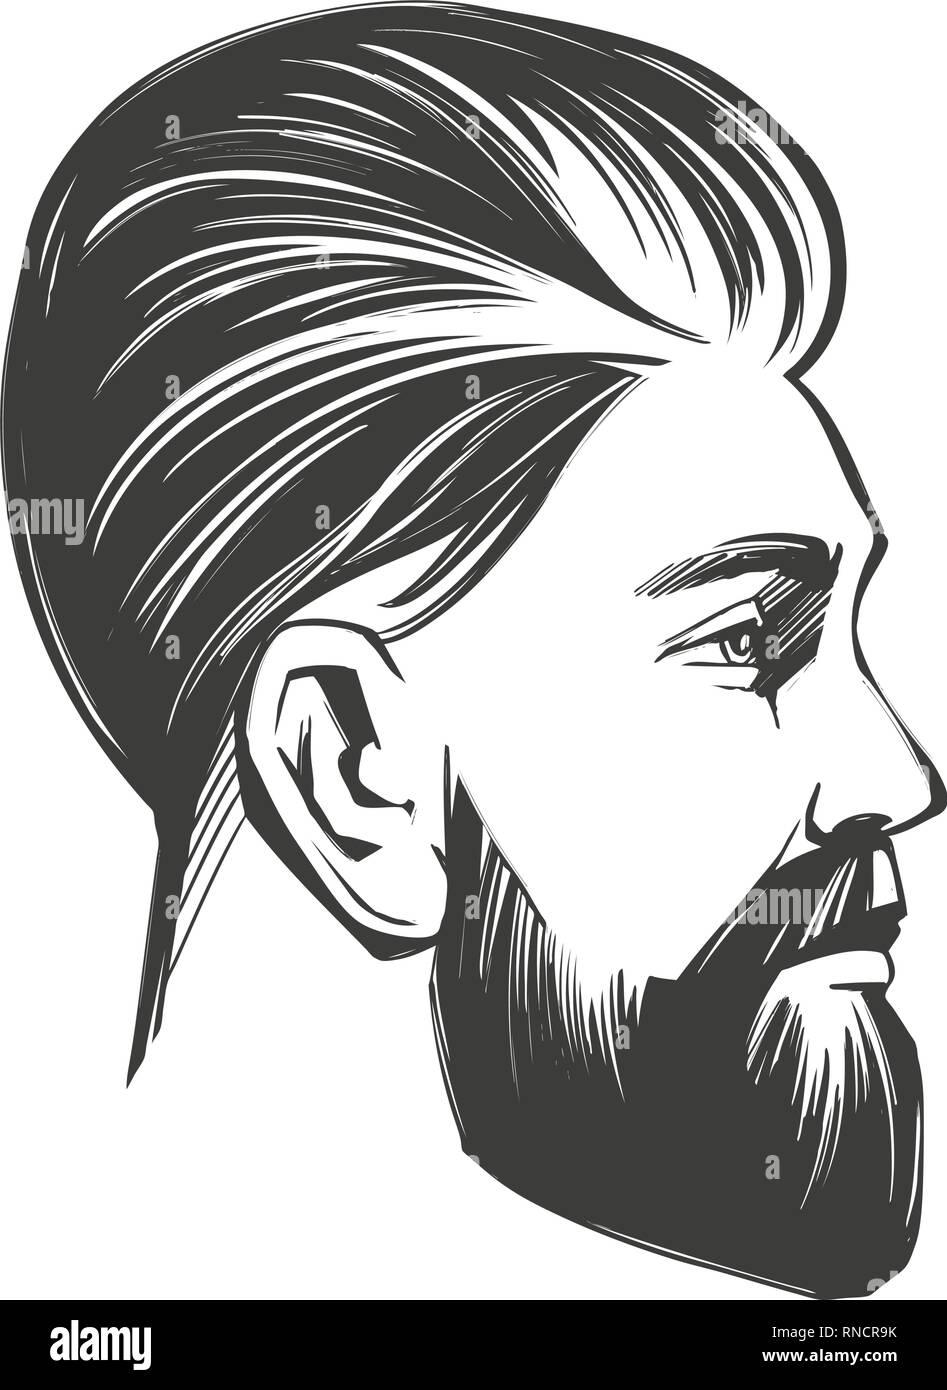 Bearded Man In Profile Barbershop Hairstyle Haircut Hand Drawn